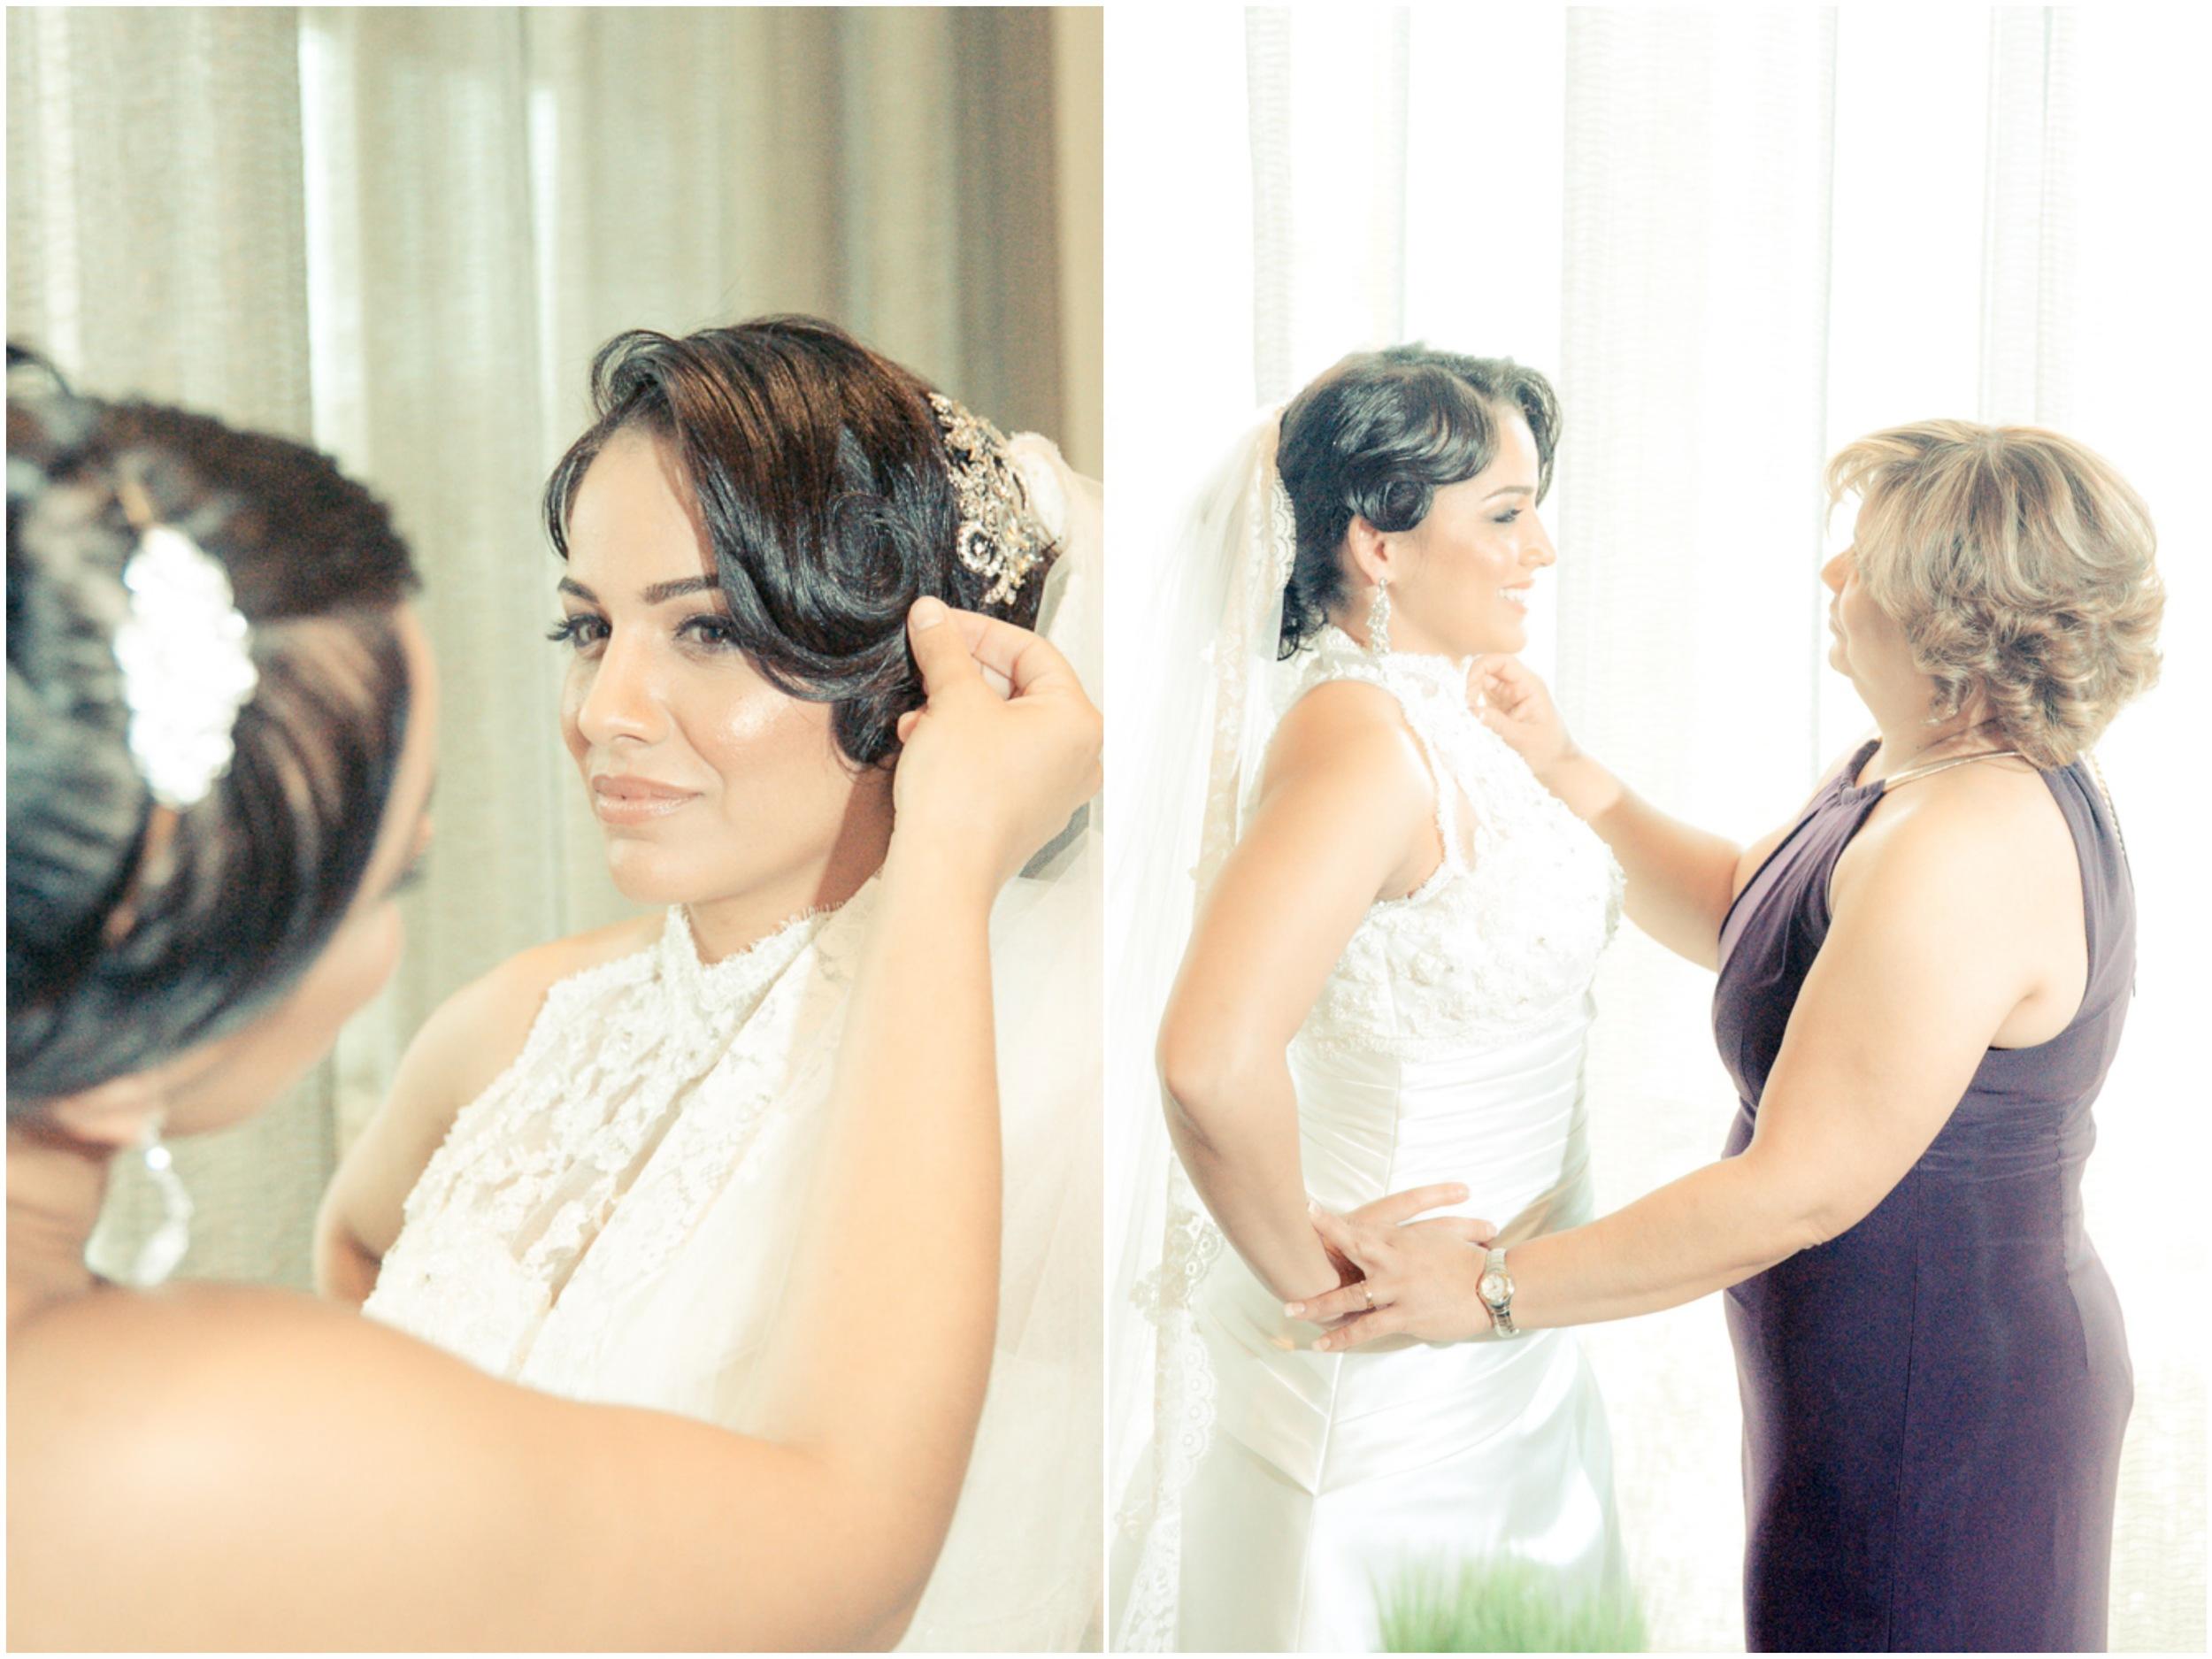 Bradly-and-Jesenia-Wedding-Collage-10.jpg